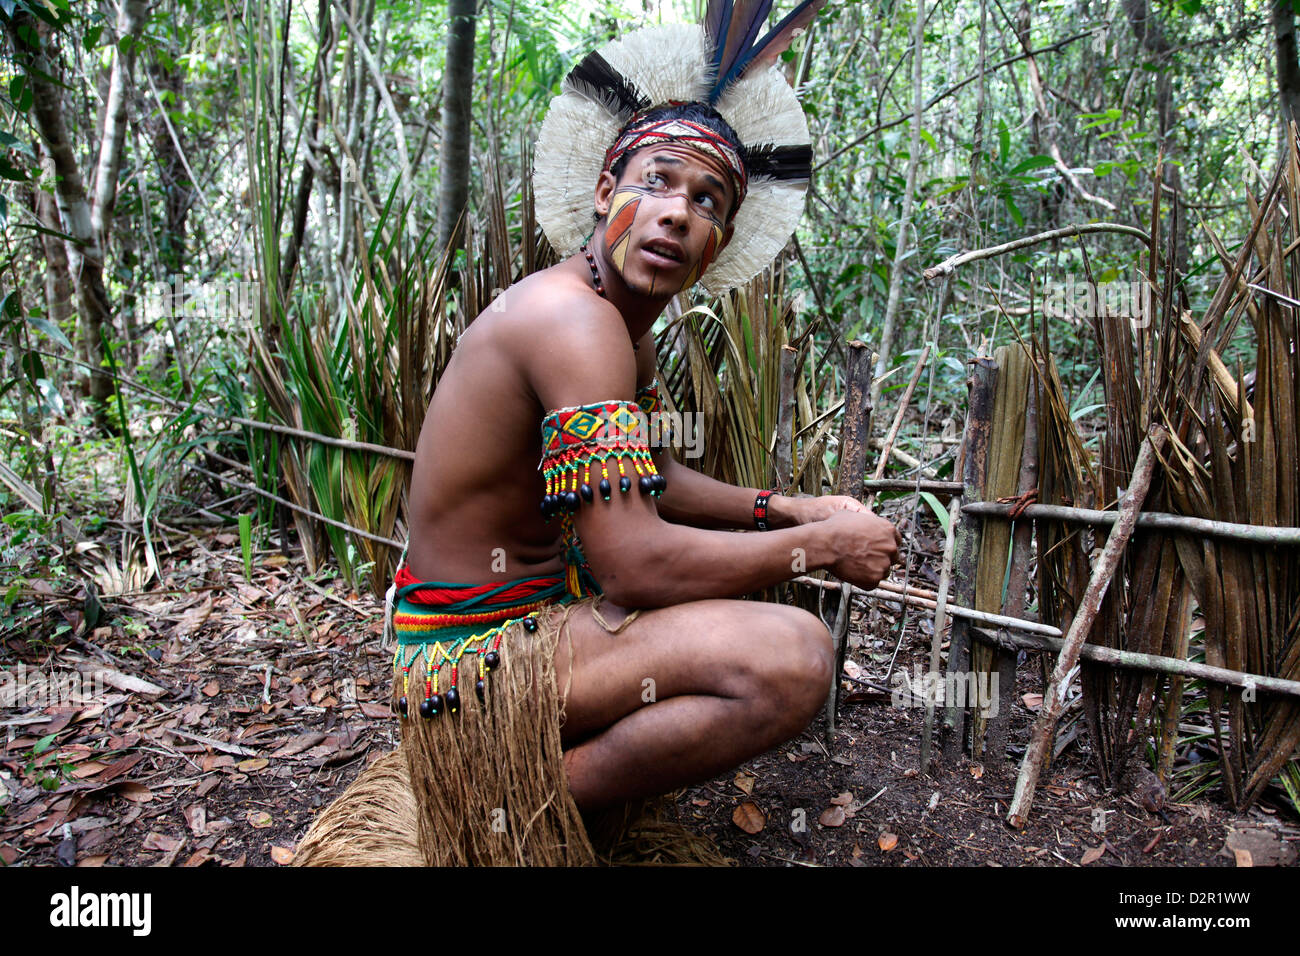 Portrait of a Pataxo Indian man at the Reserva Indigena da Jaqueira near Porto Seguro, Bahia, Brazil, South America - Stock Image